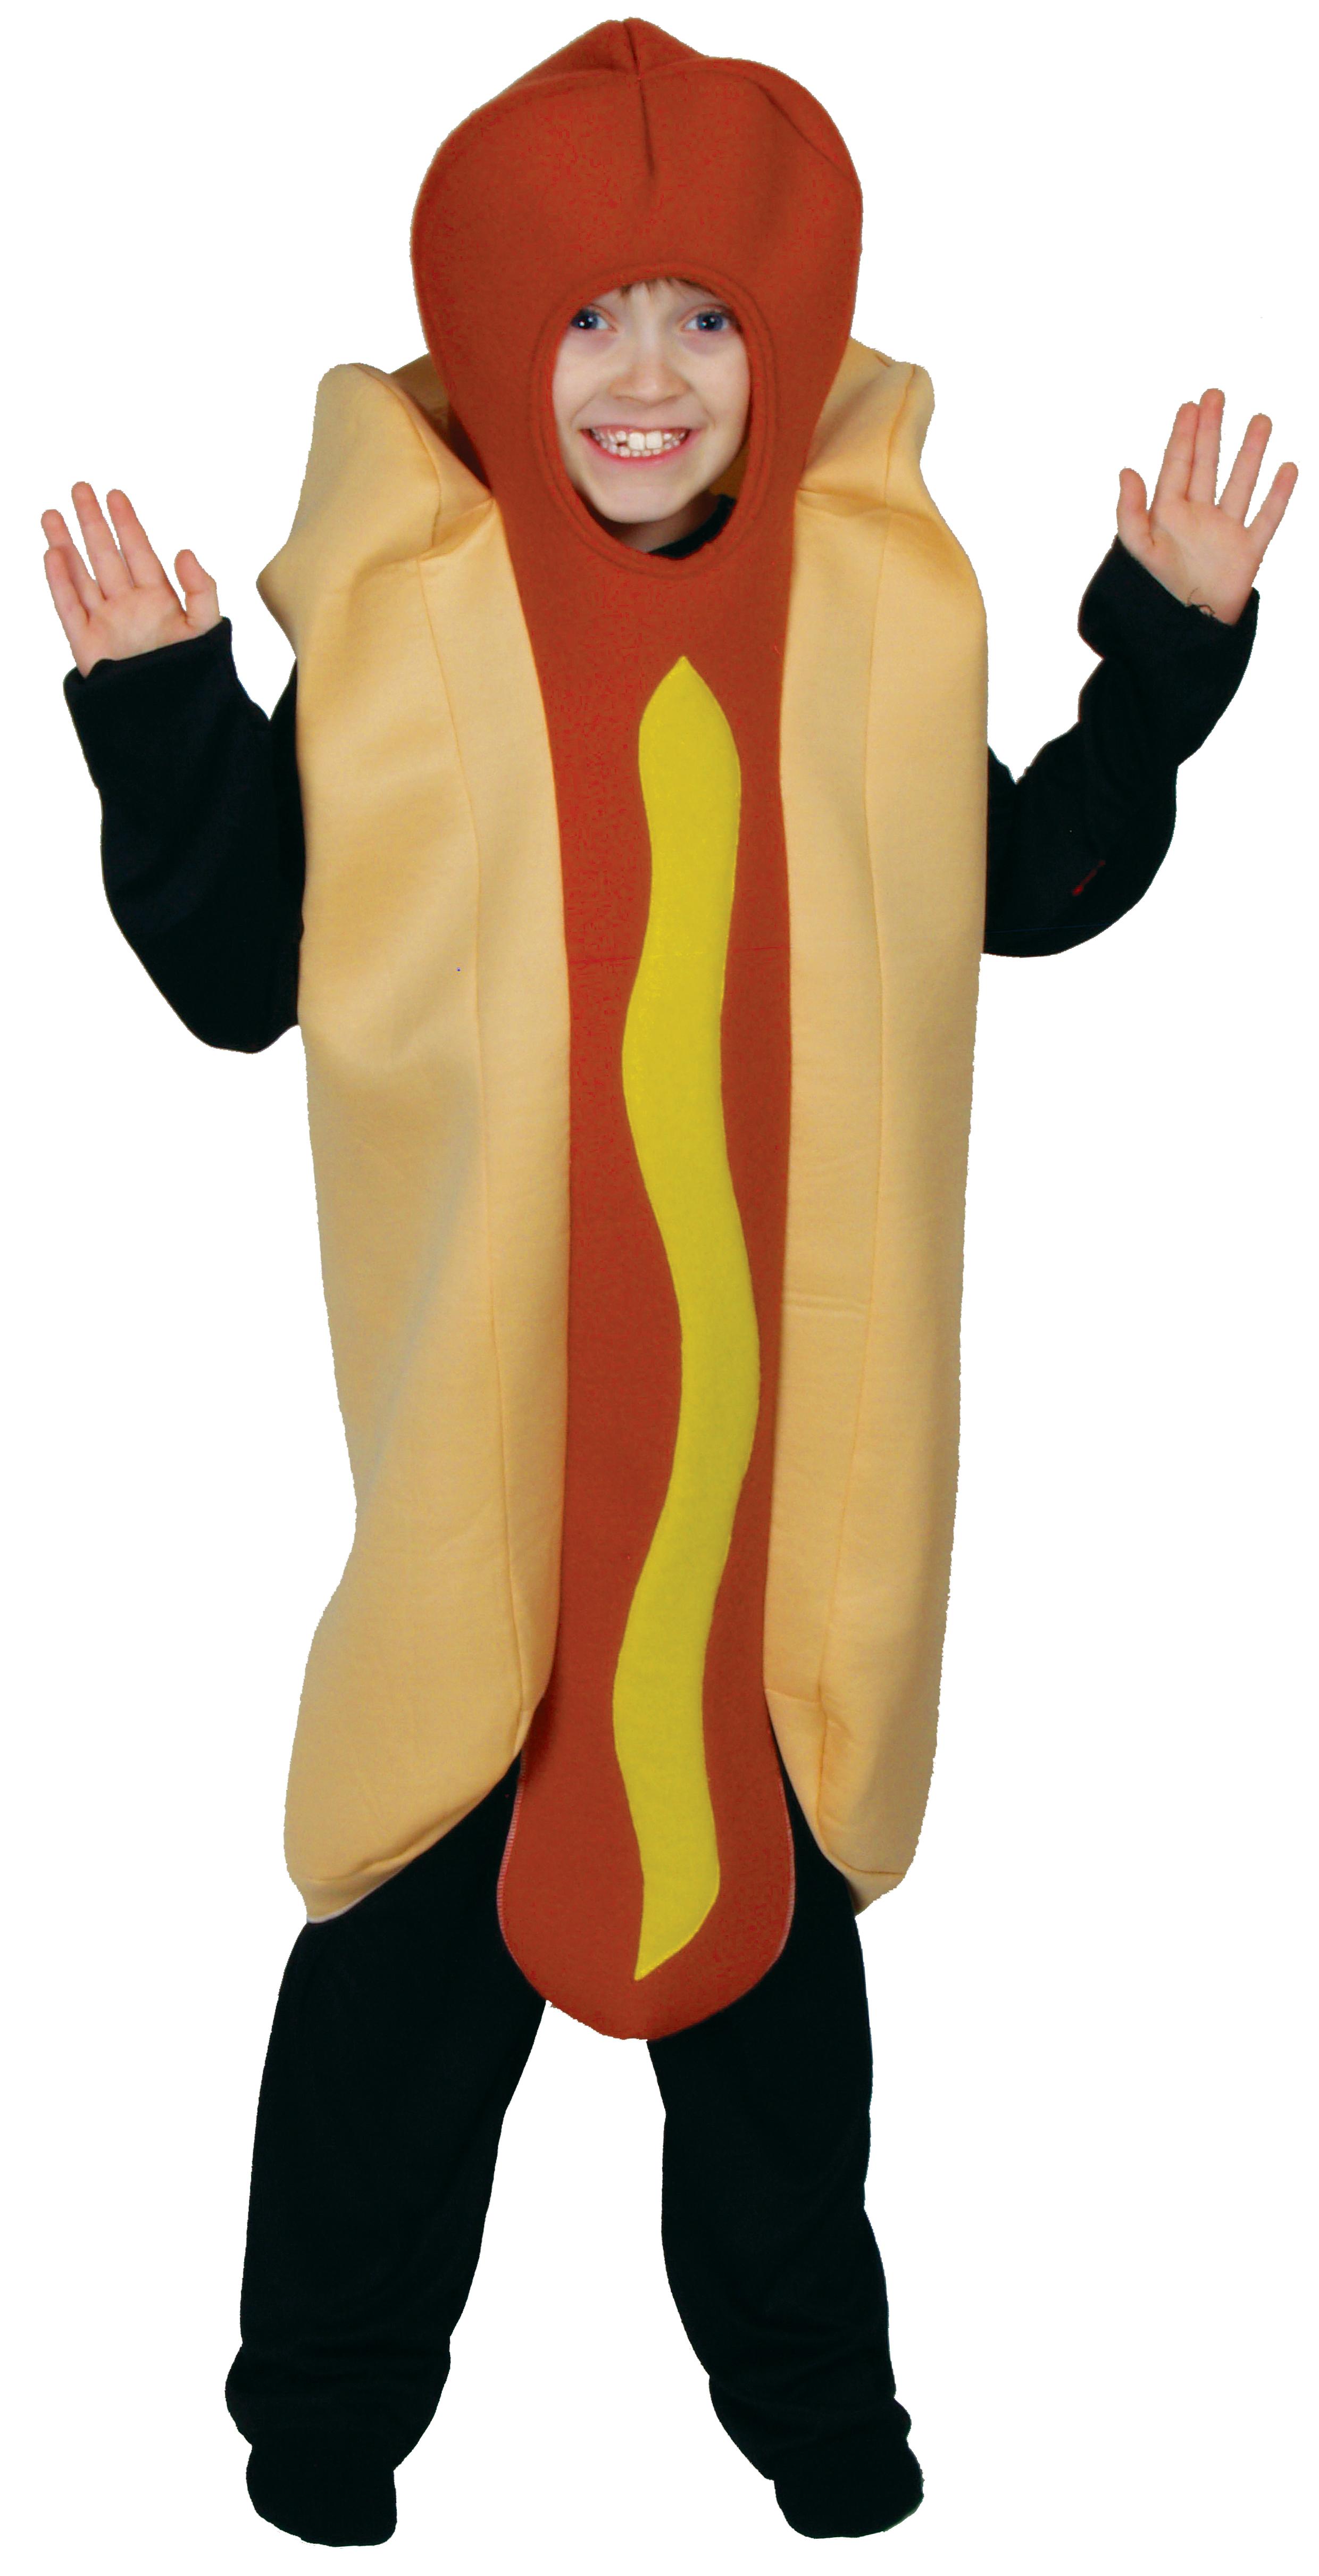 Kid's Hot Dog Costume   Boys Fancy Dress Costumes   Mega Fancy Dress Hot Dog Costume